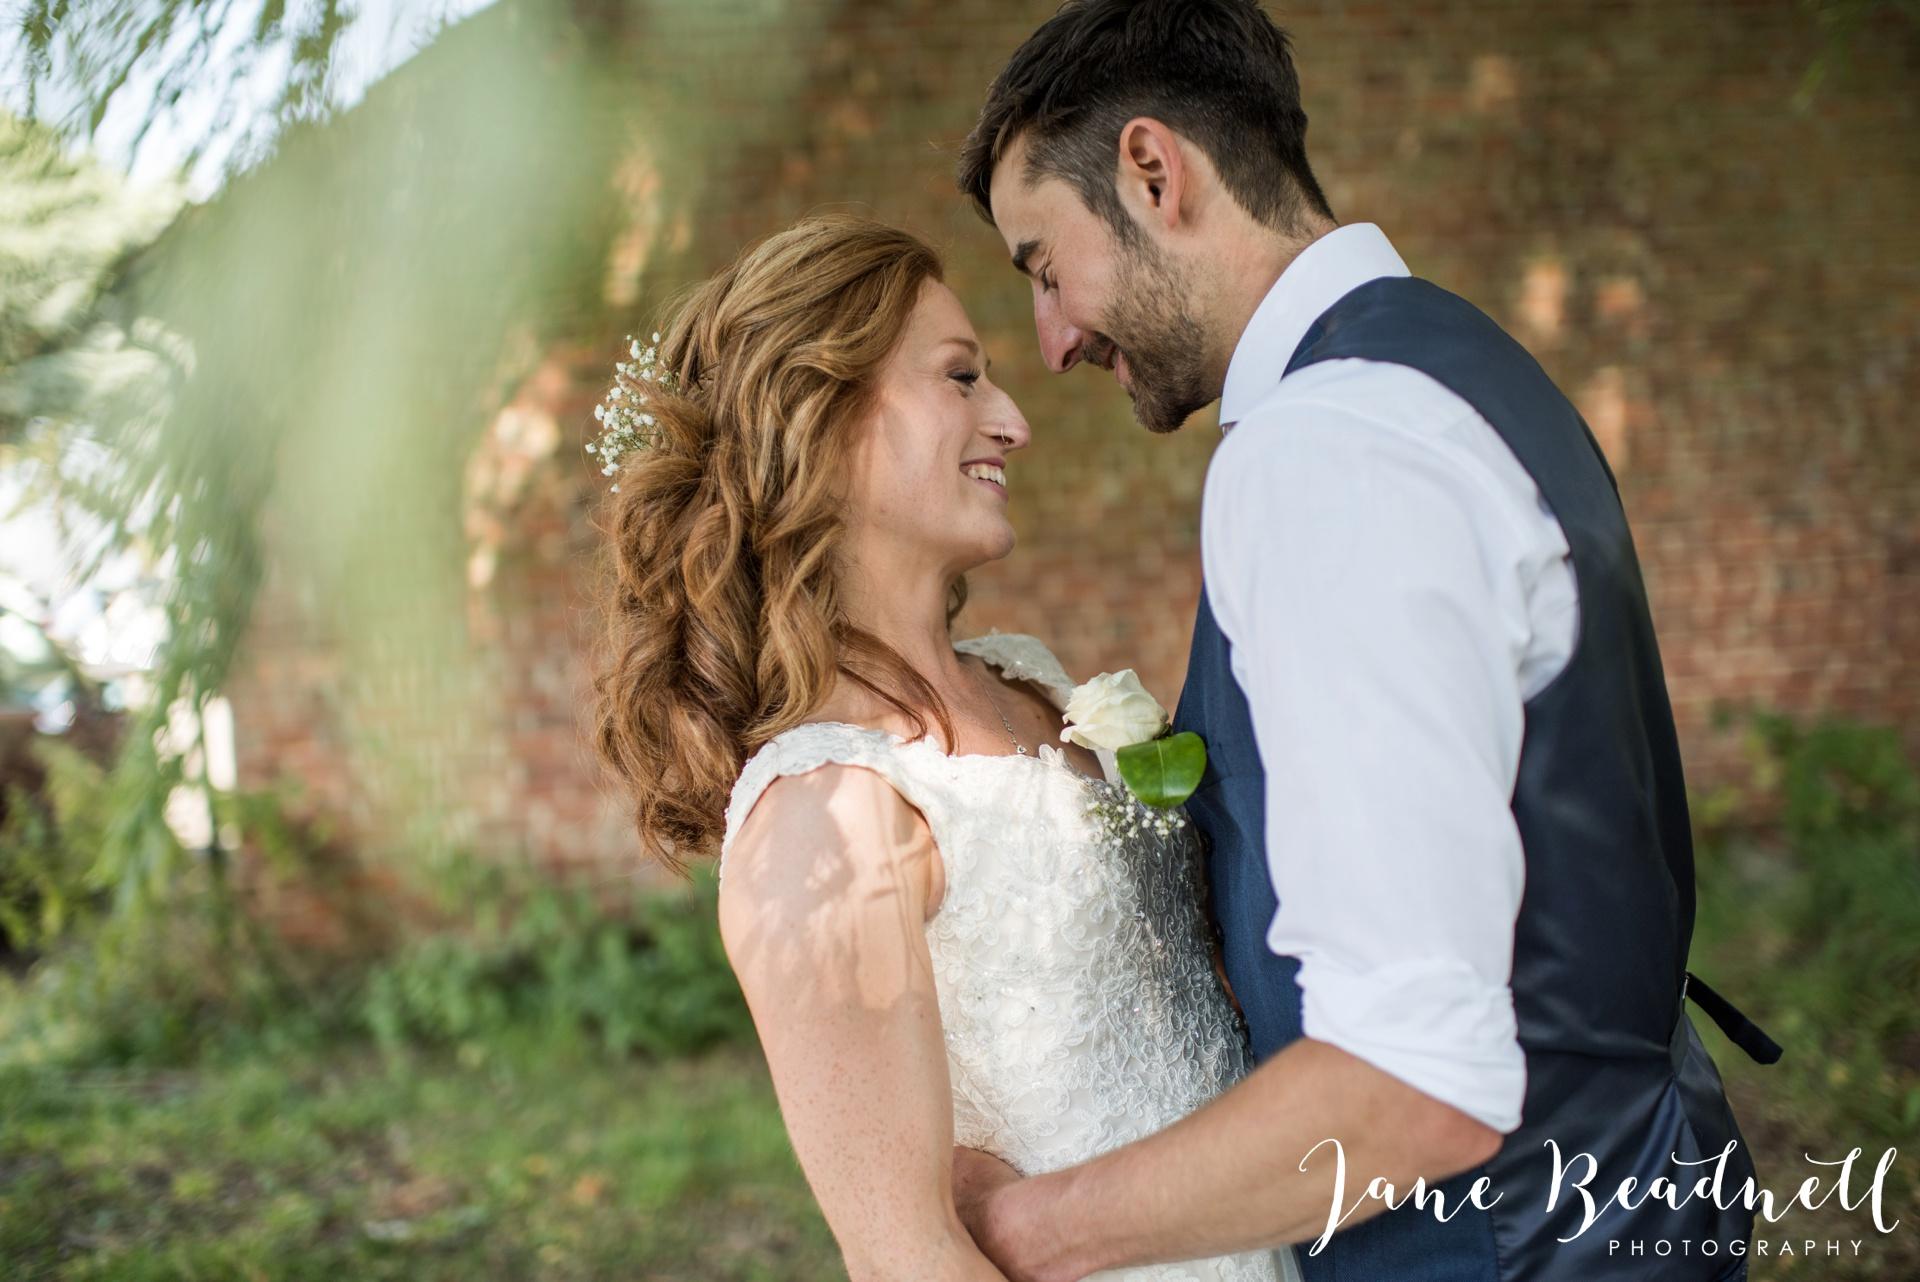 yorkshire-fine-art-wedding-photographer-jane-beadnell-photography-poppleton-york_0108